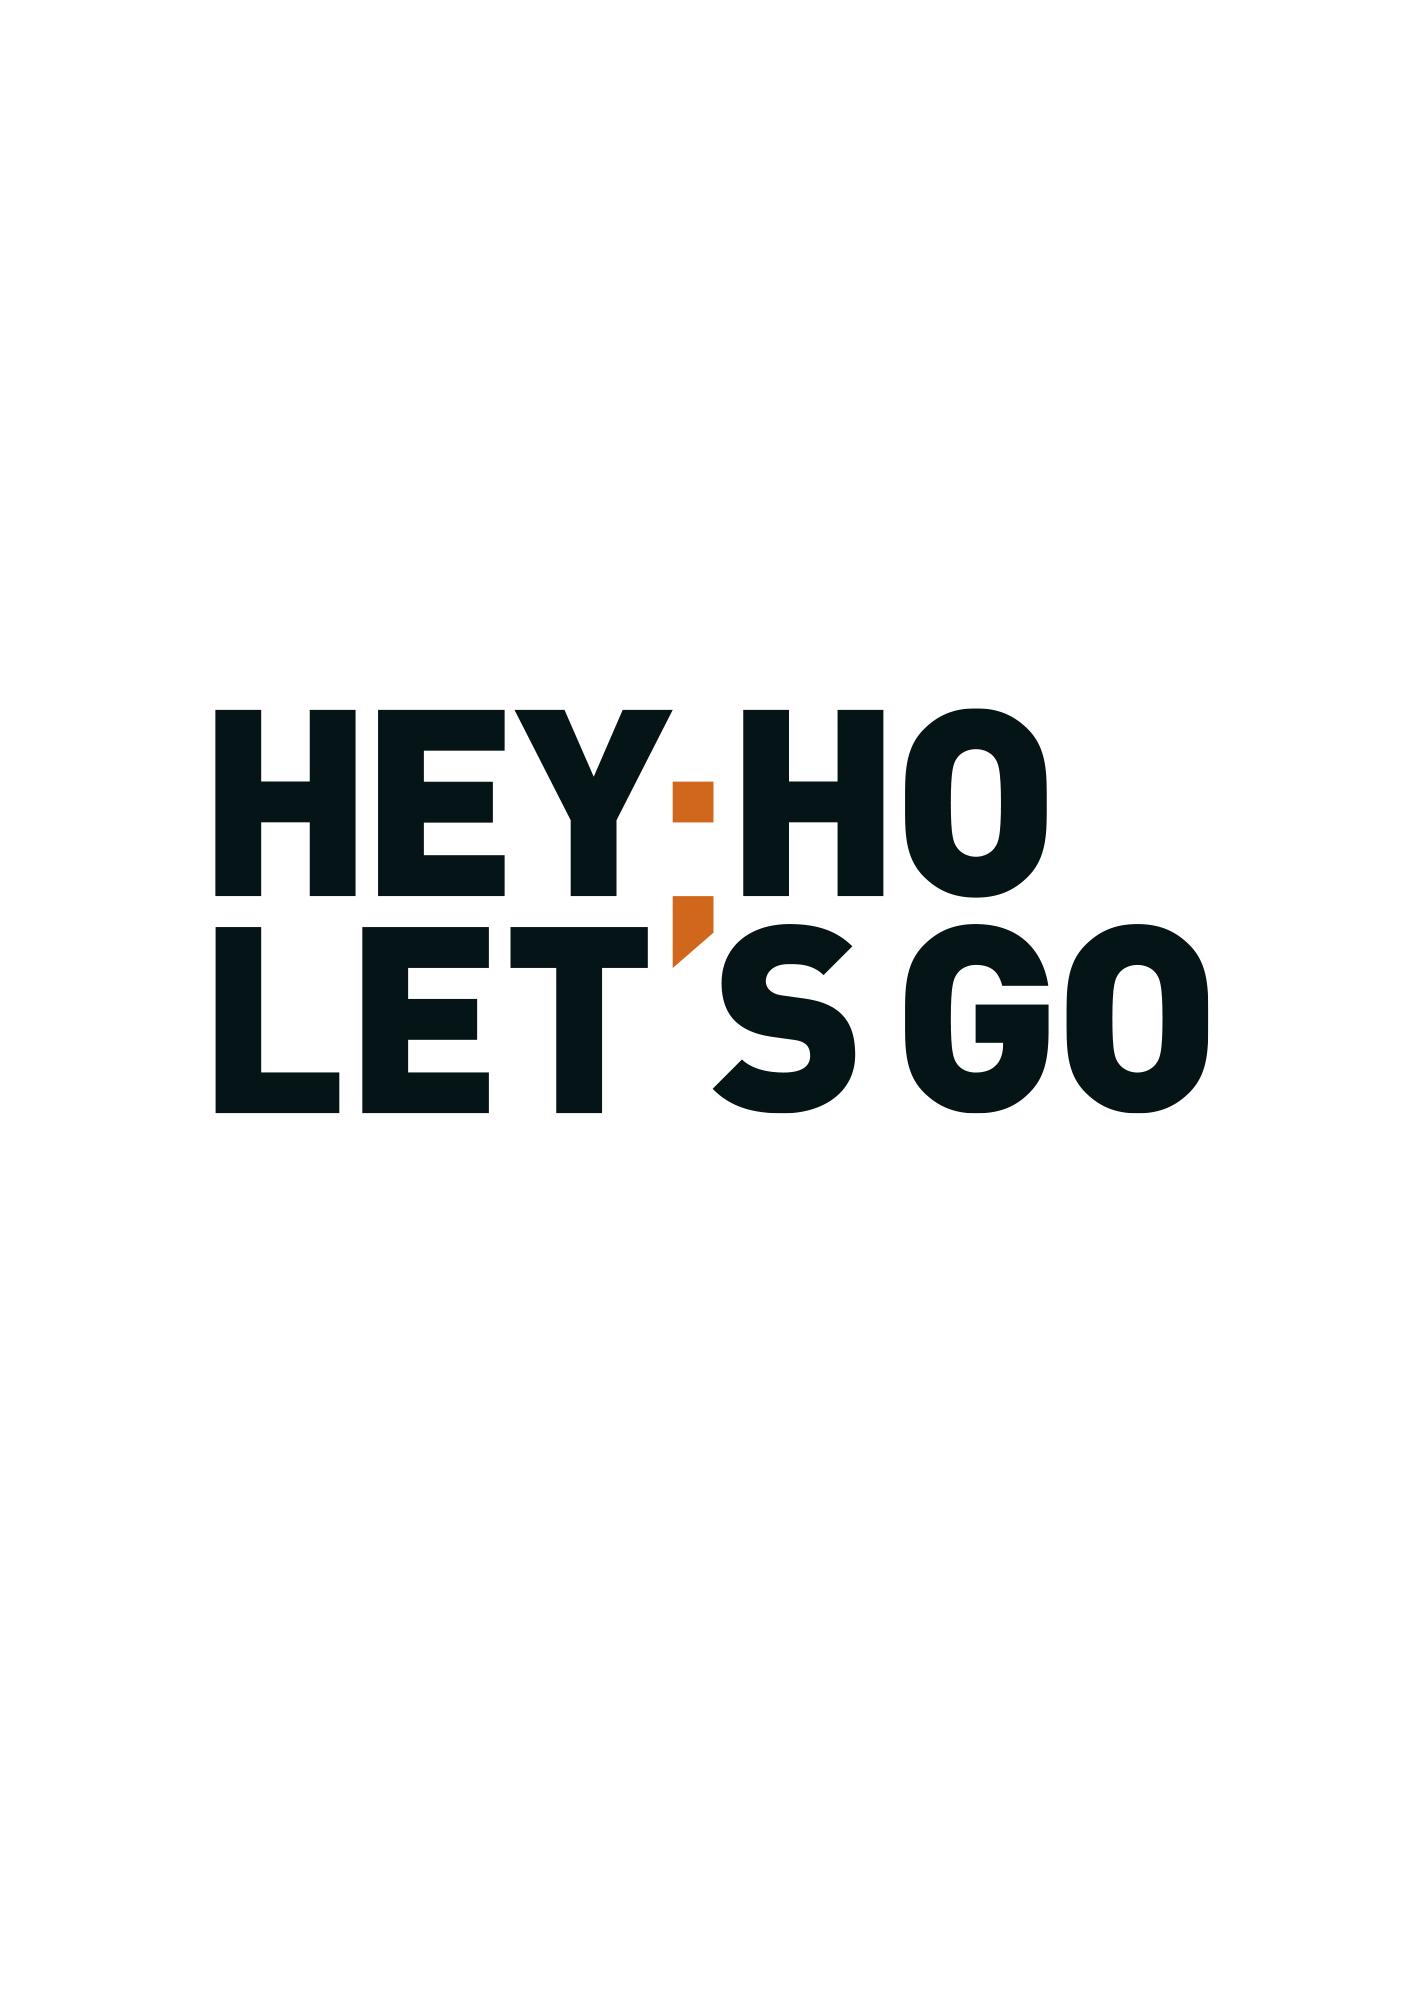 Hey-Ho Let's Go